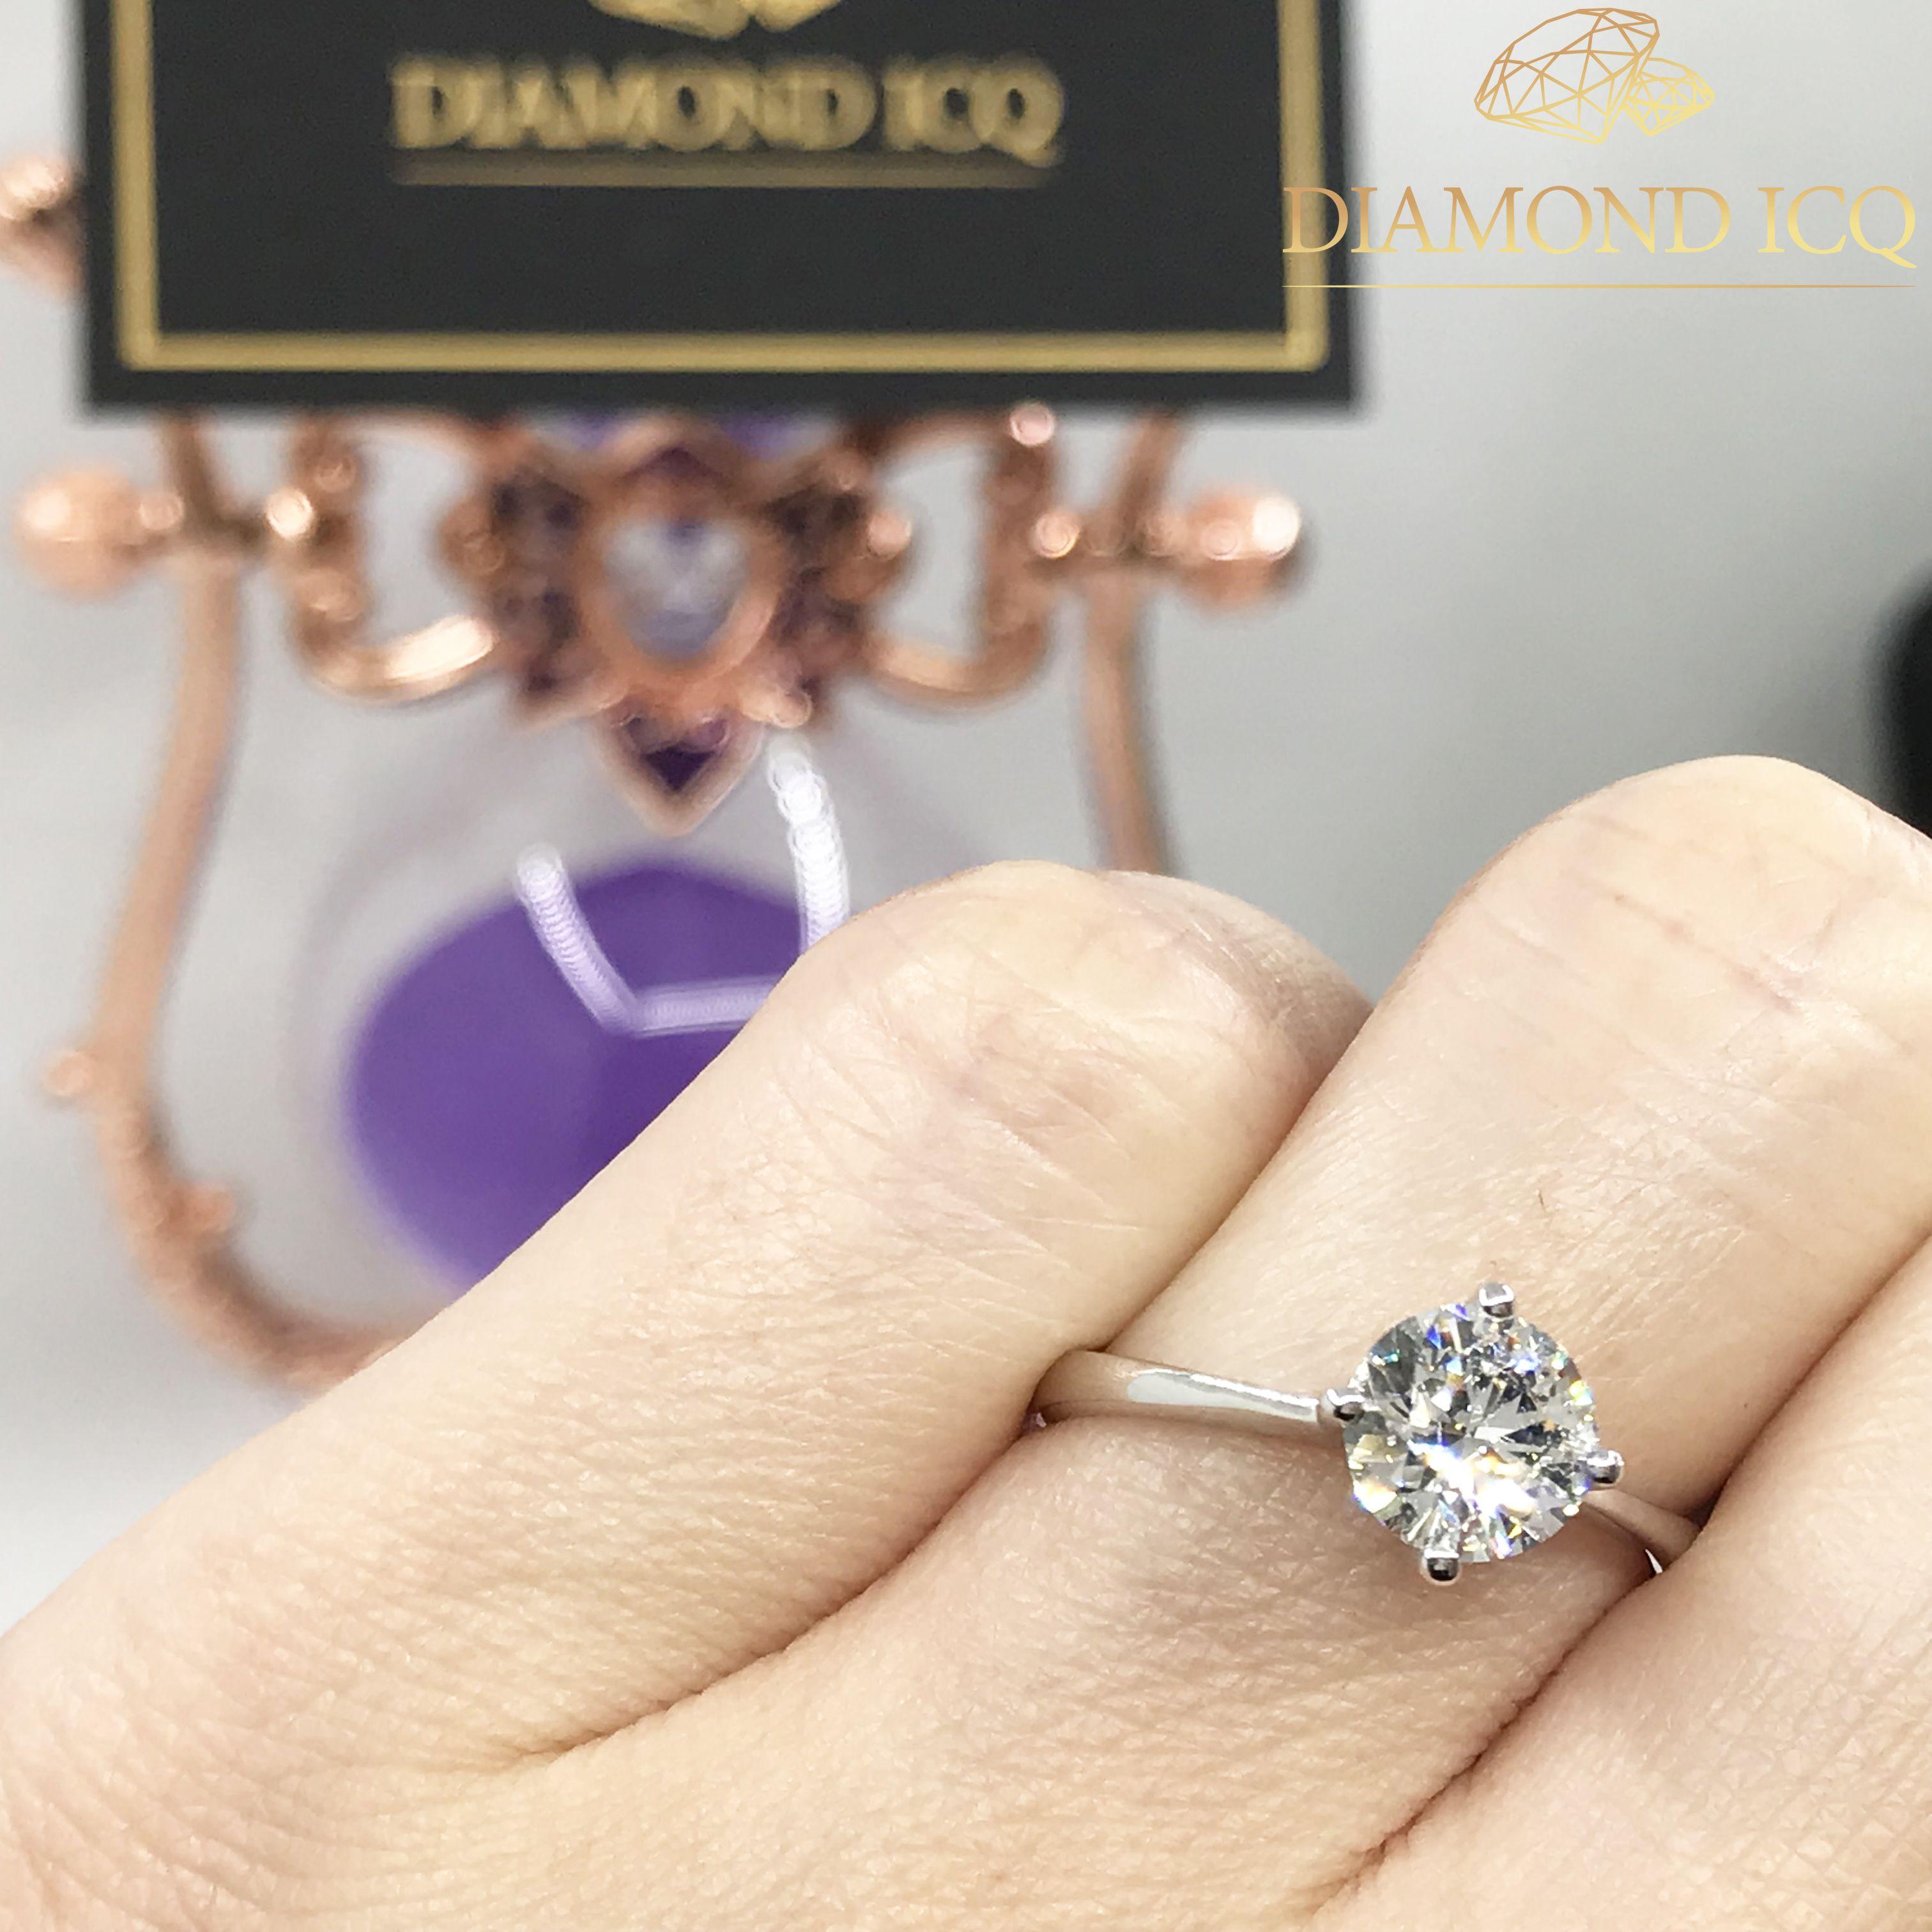 Diamond ICQ Diamond Shop The Diamond Specialist {Cash